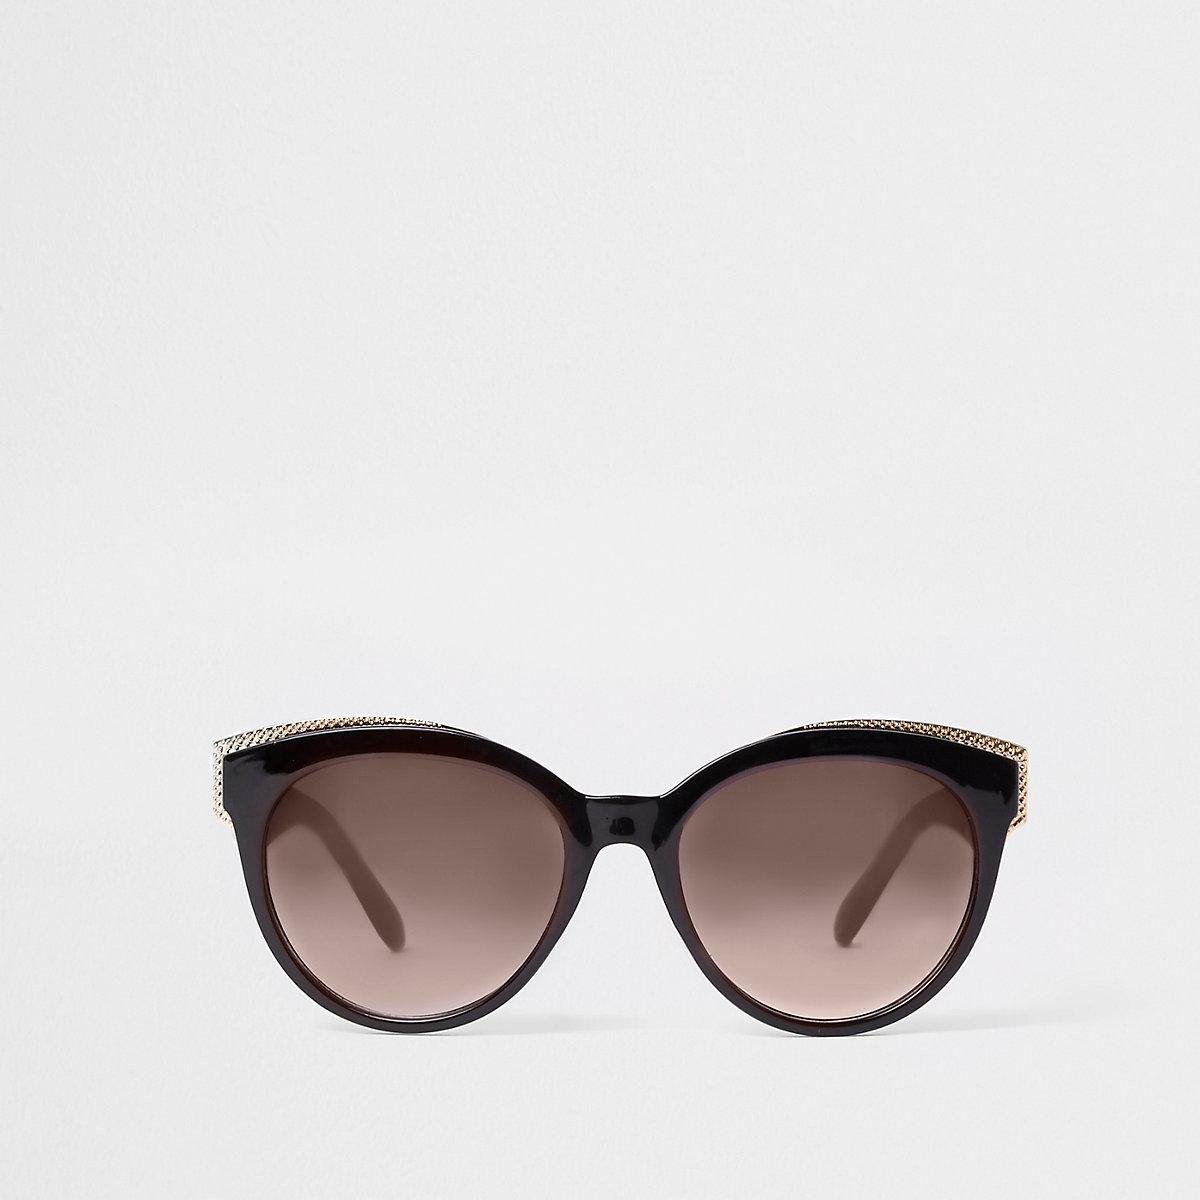 Black gold tone trim cat eye sunglasses